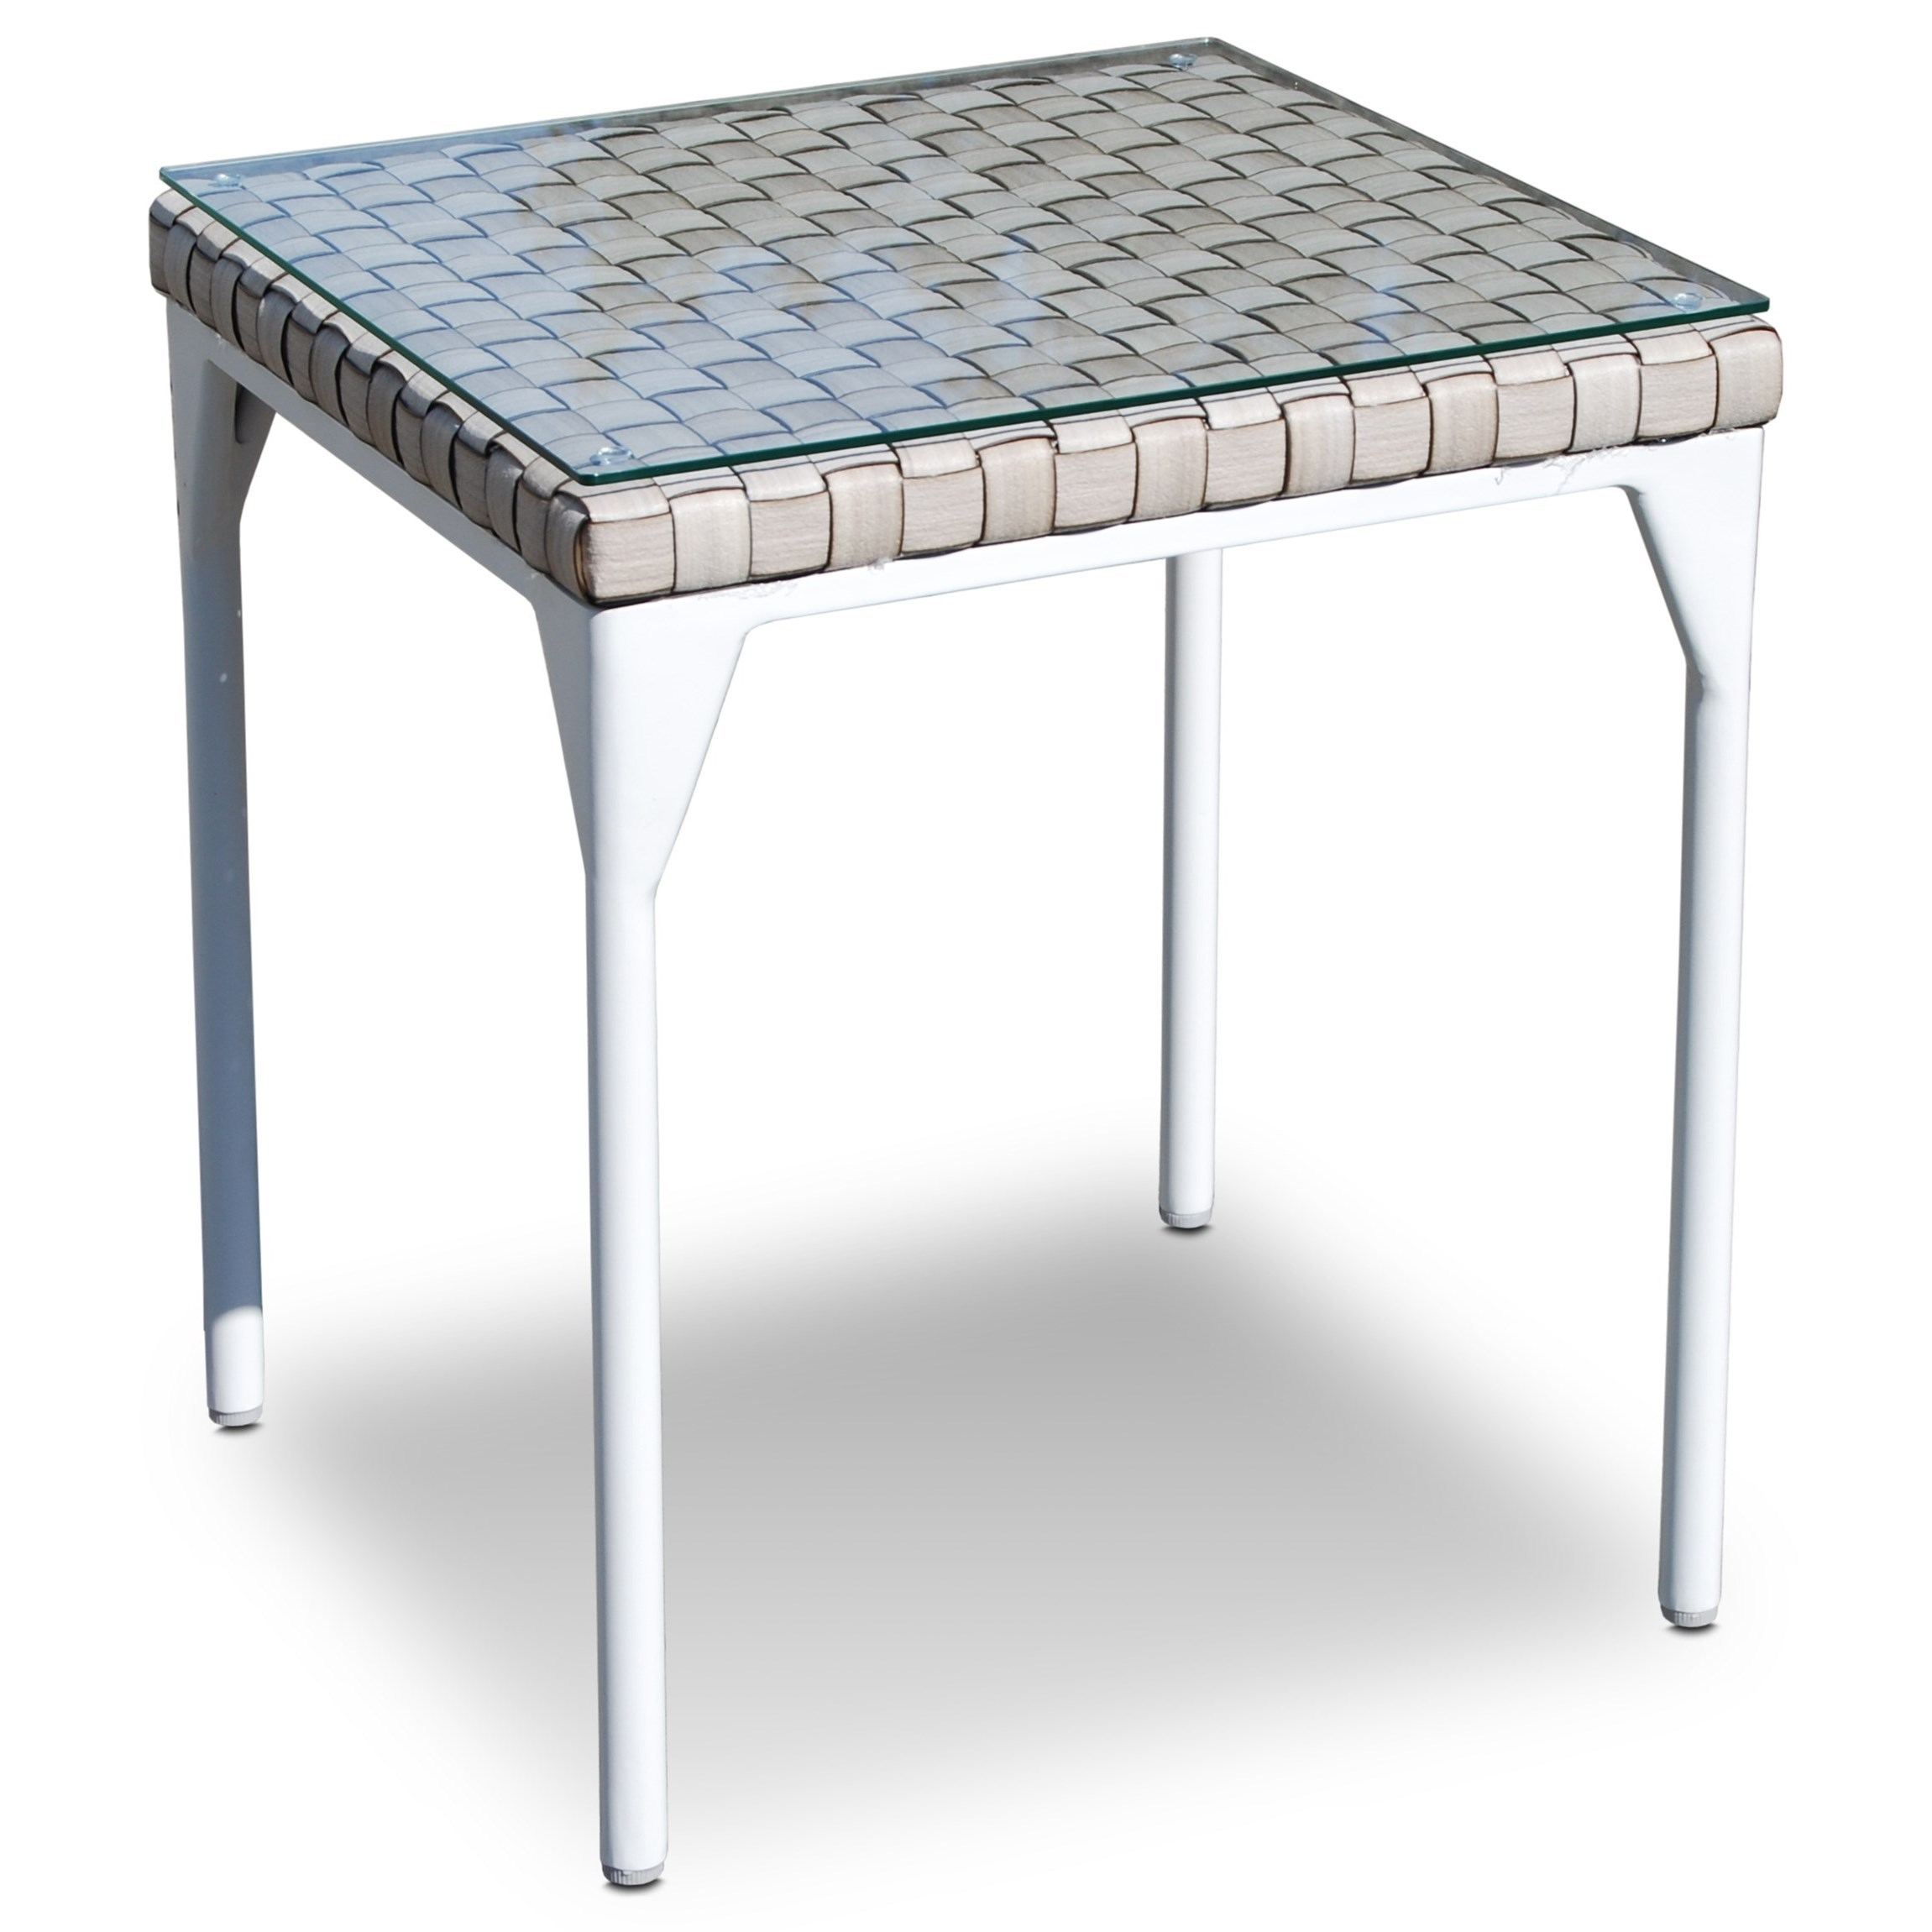 BRAFTA Outdoor Side Table by Skyline Design at Baer's Furniture